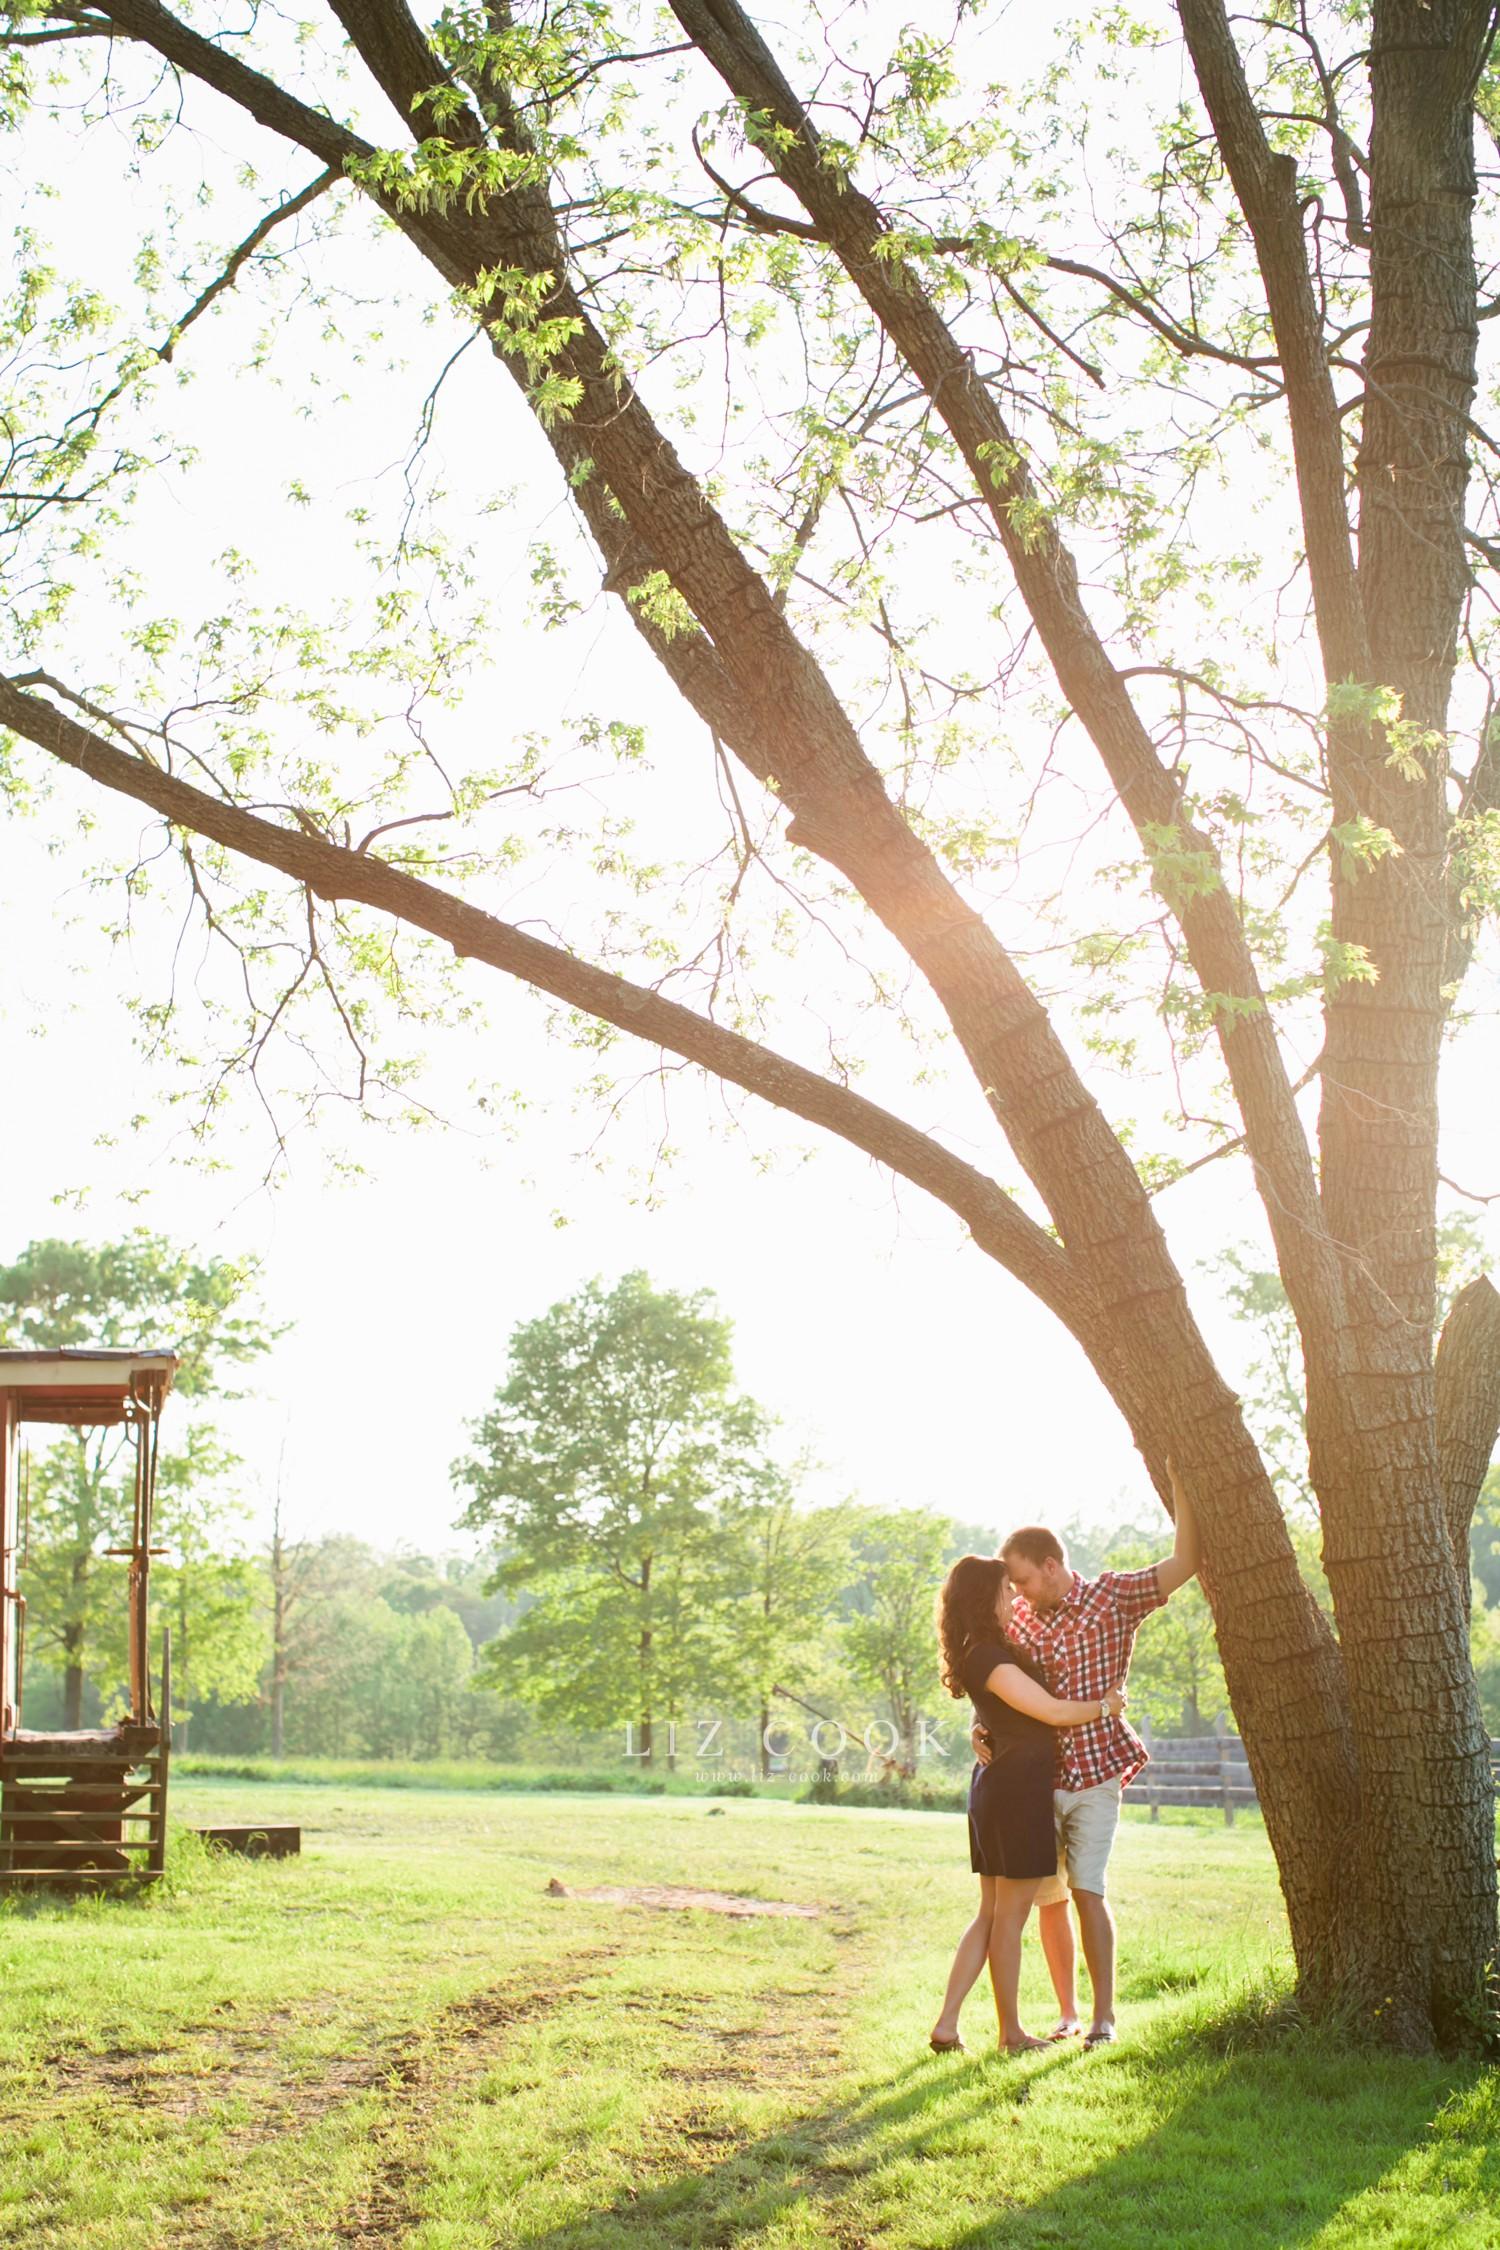 appomattox_lavender_farm_pictures_liz_cook_photography_0009.jpg